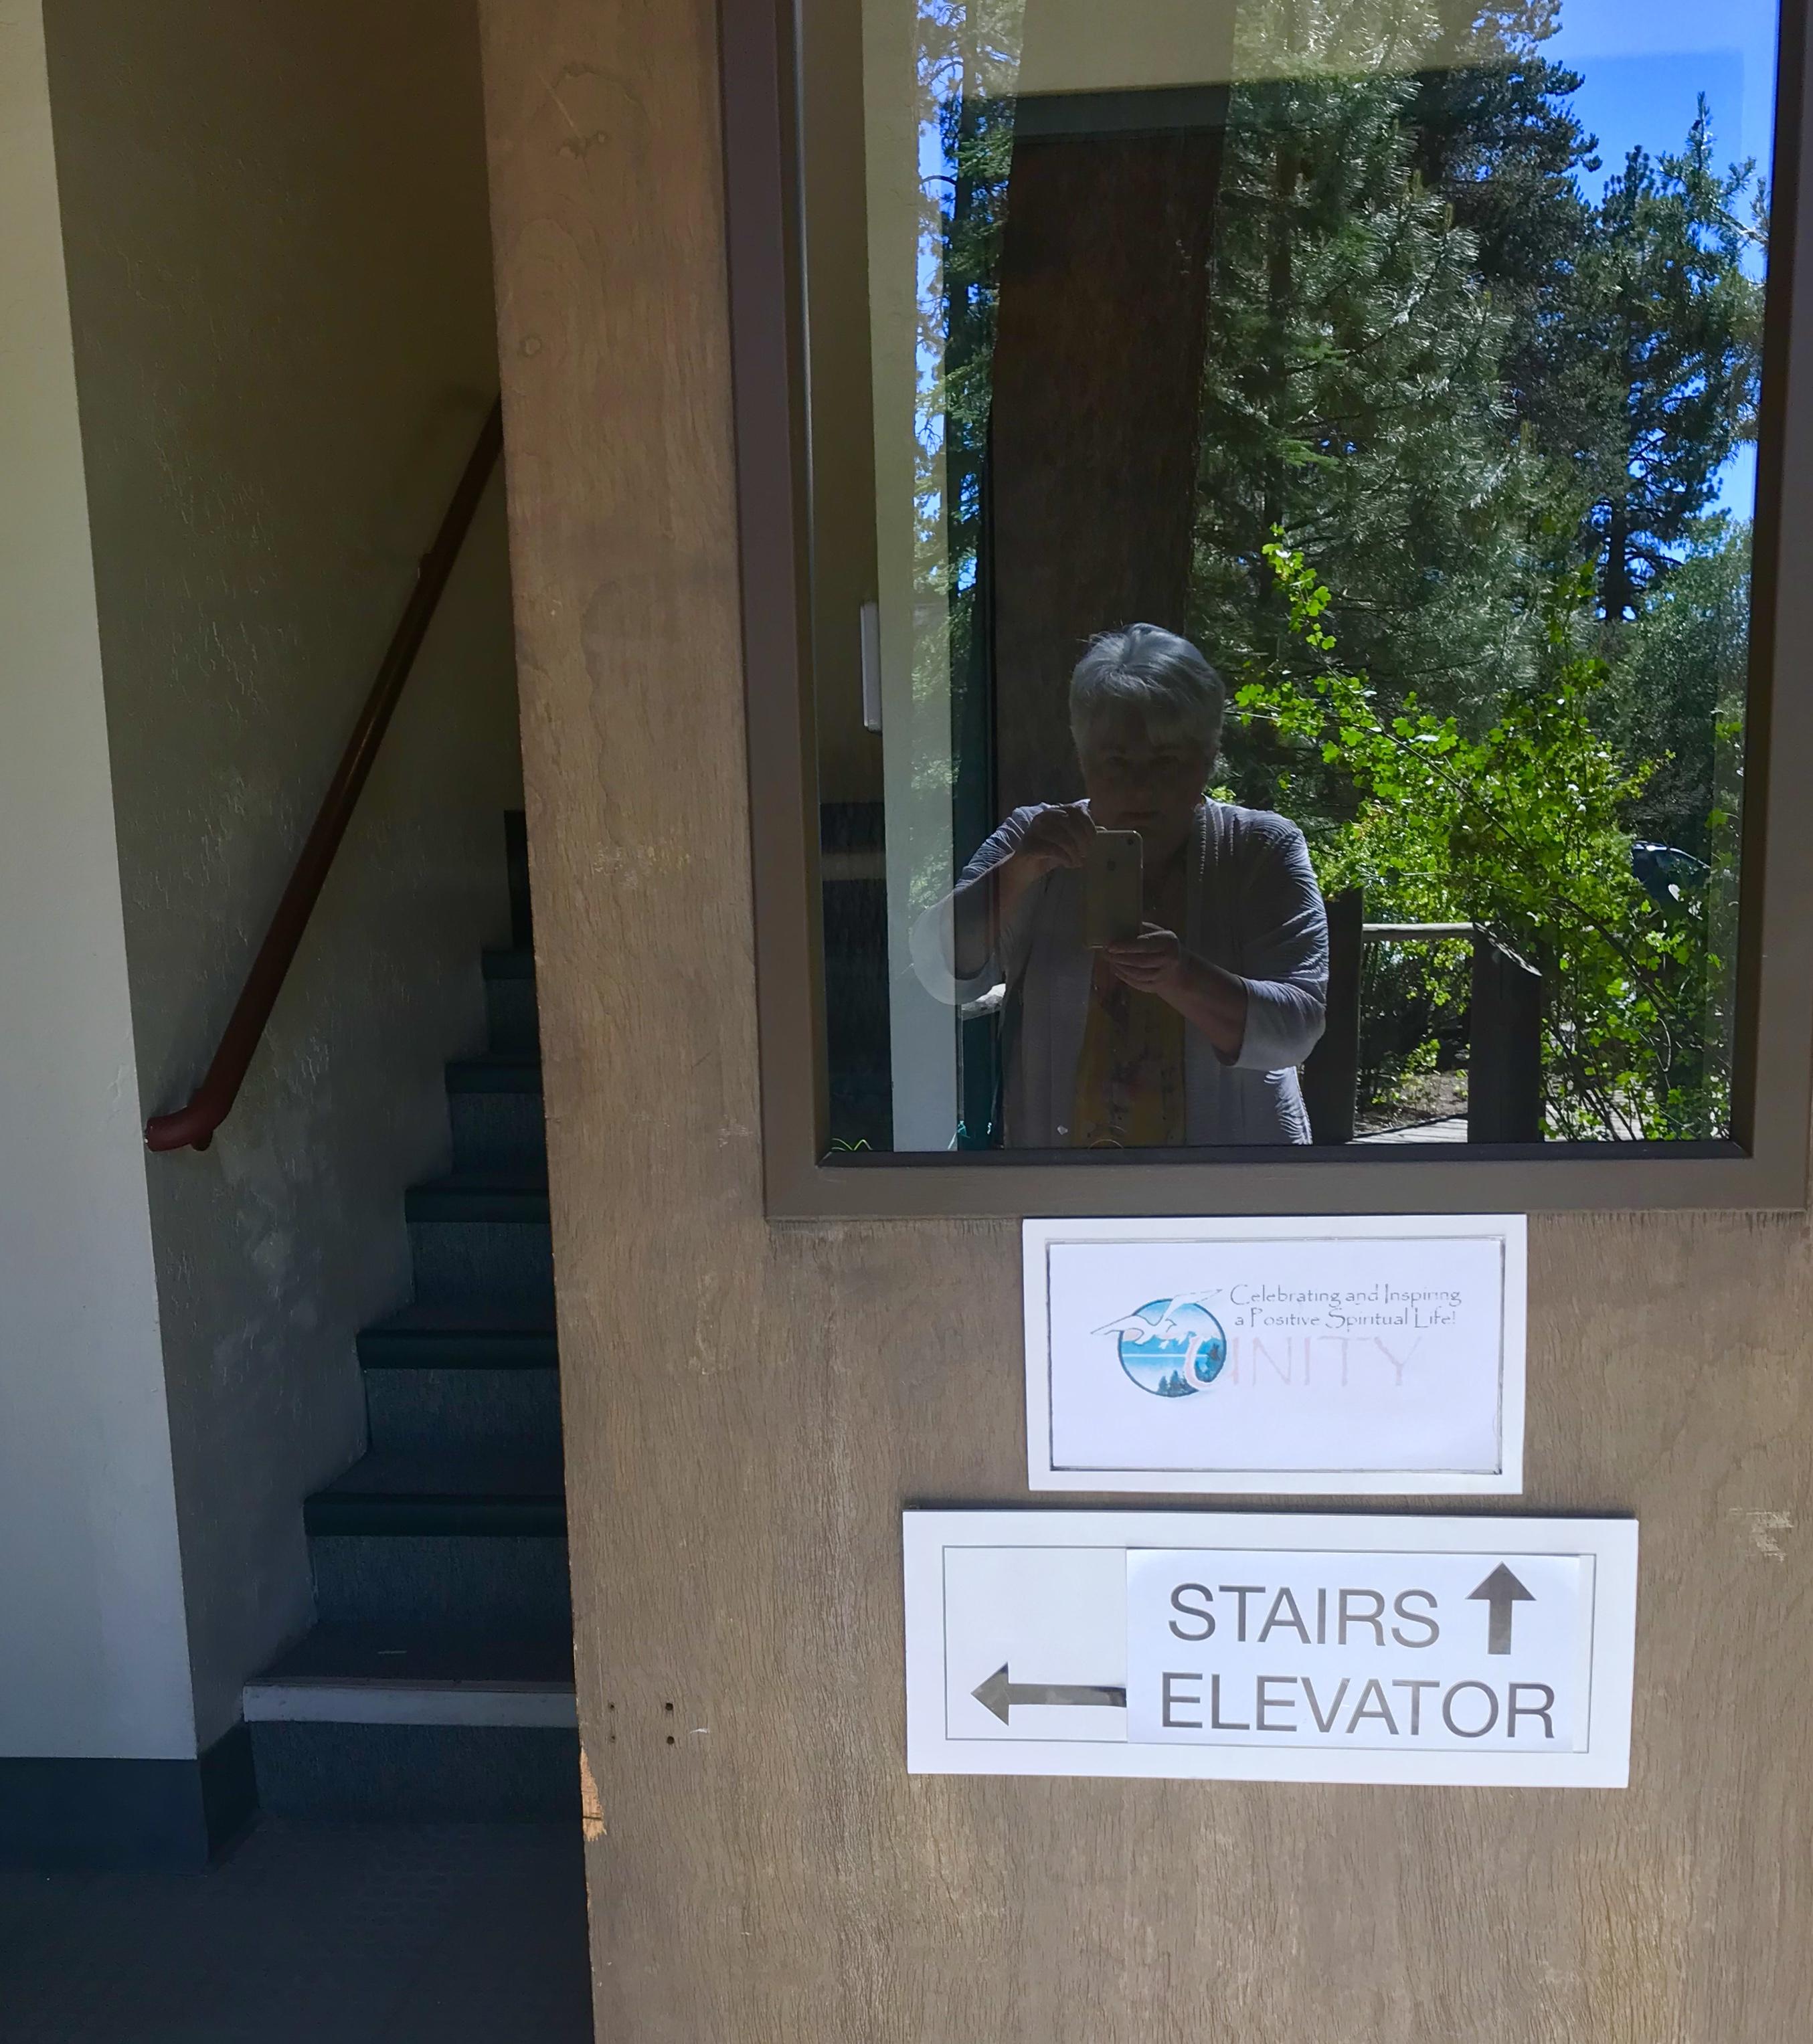 Upstairs to UATL